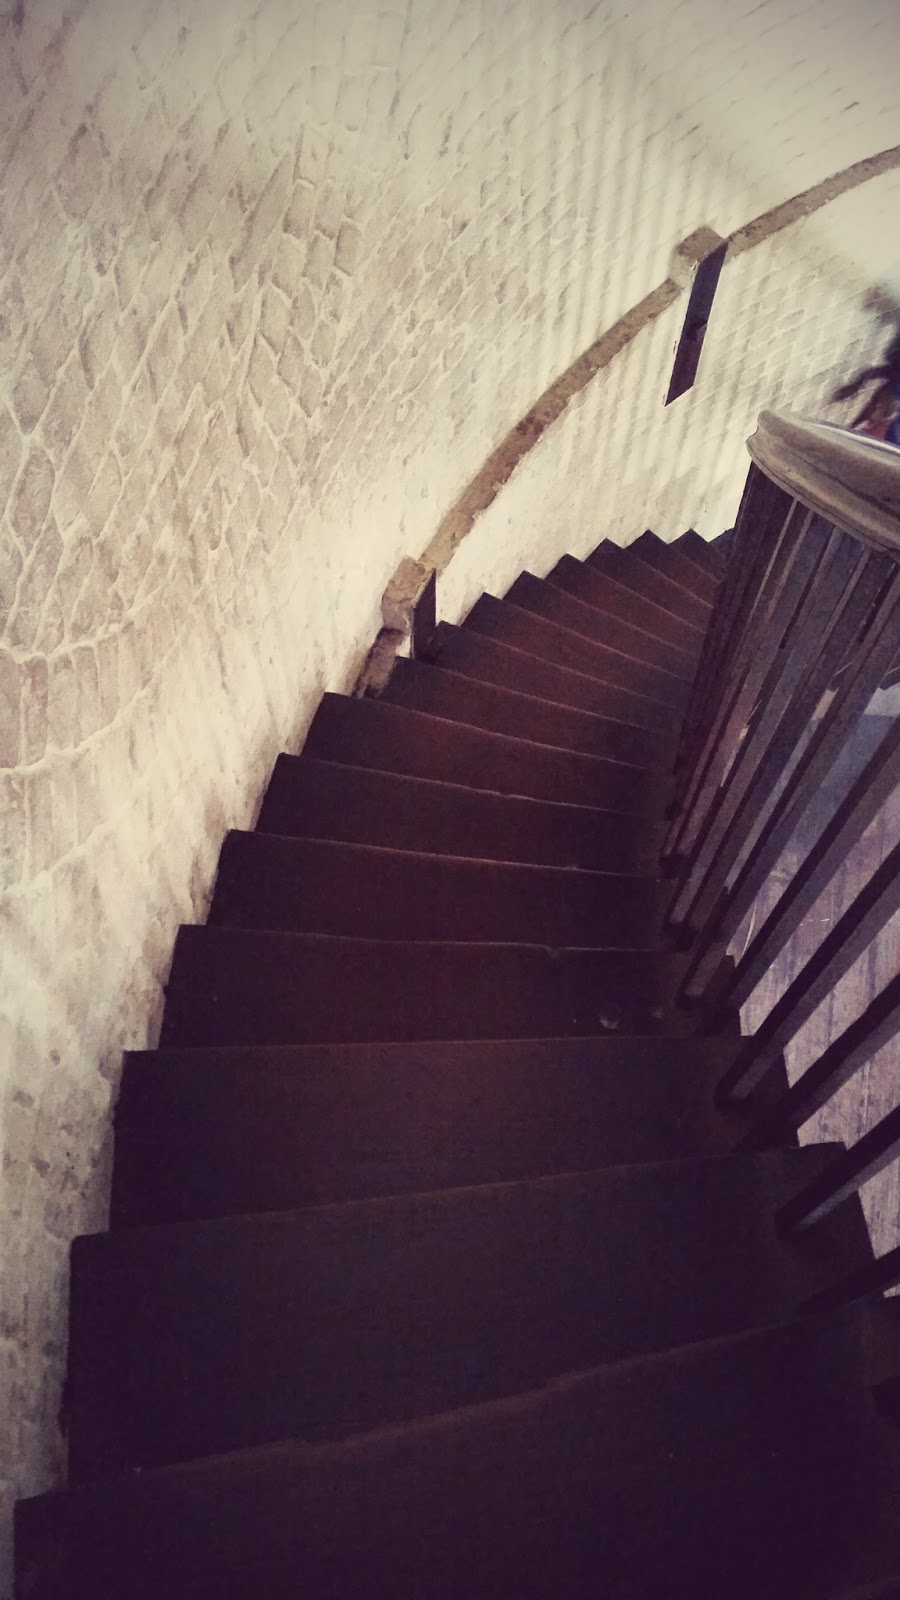 Pandangan tangga dari atas